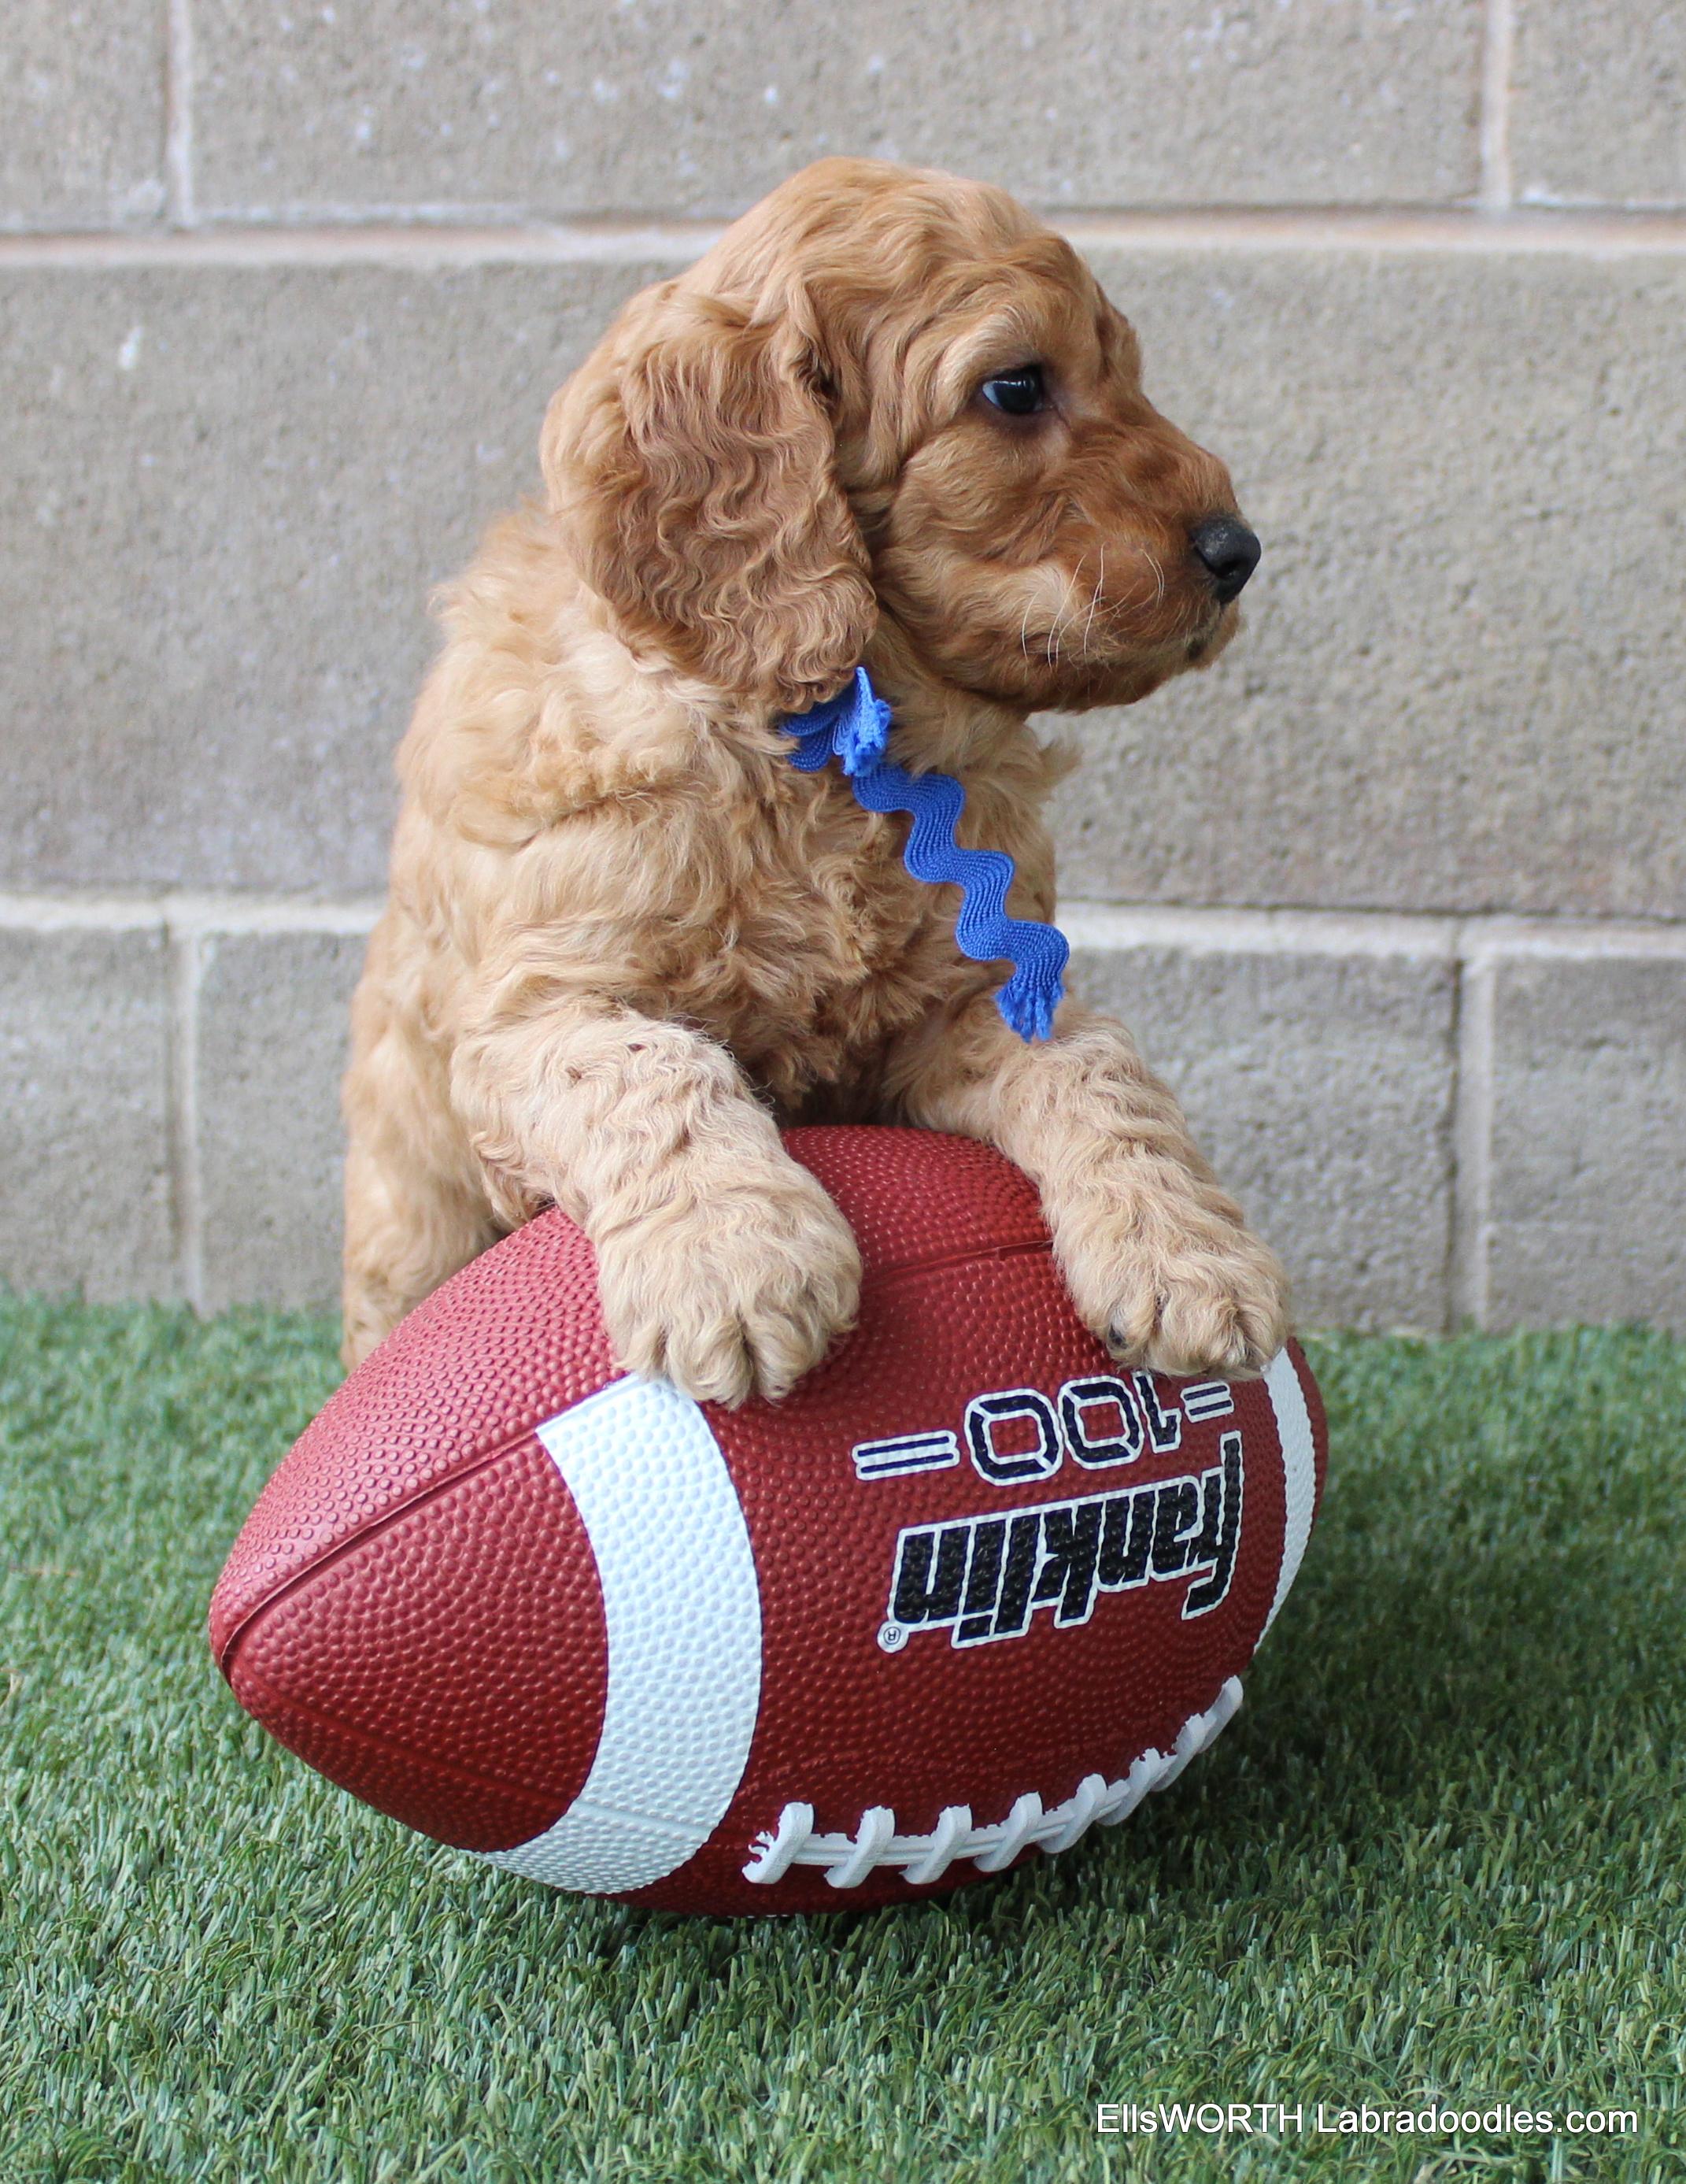 he liked the football